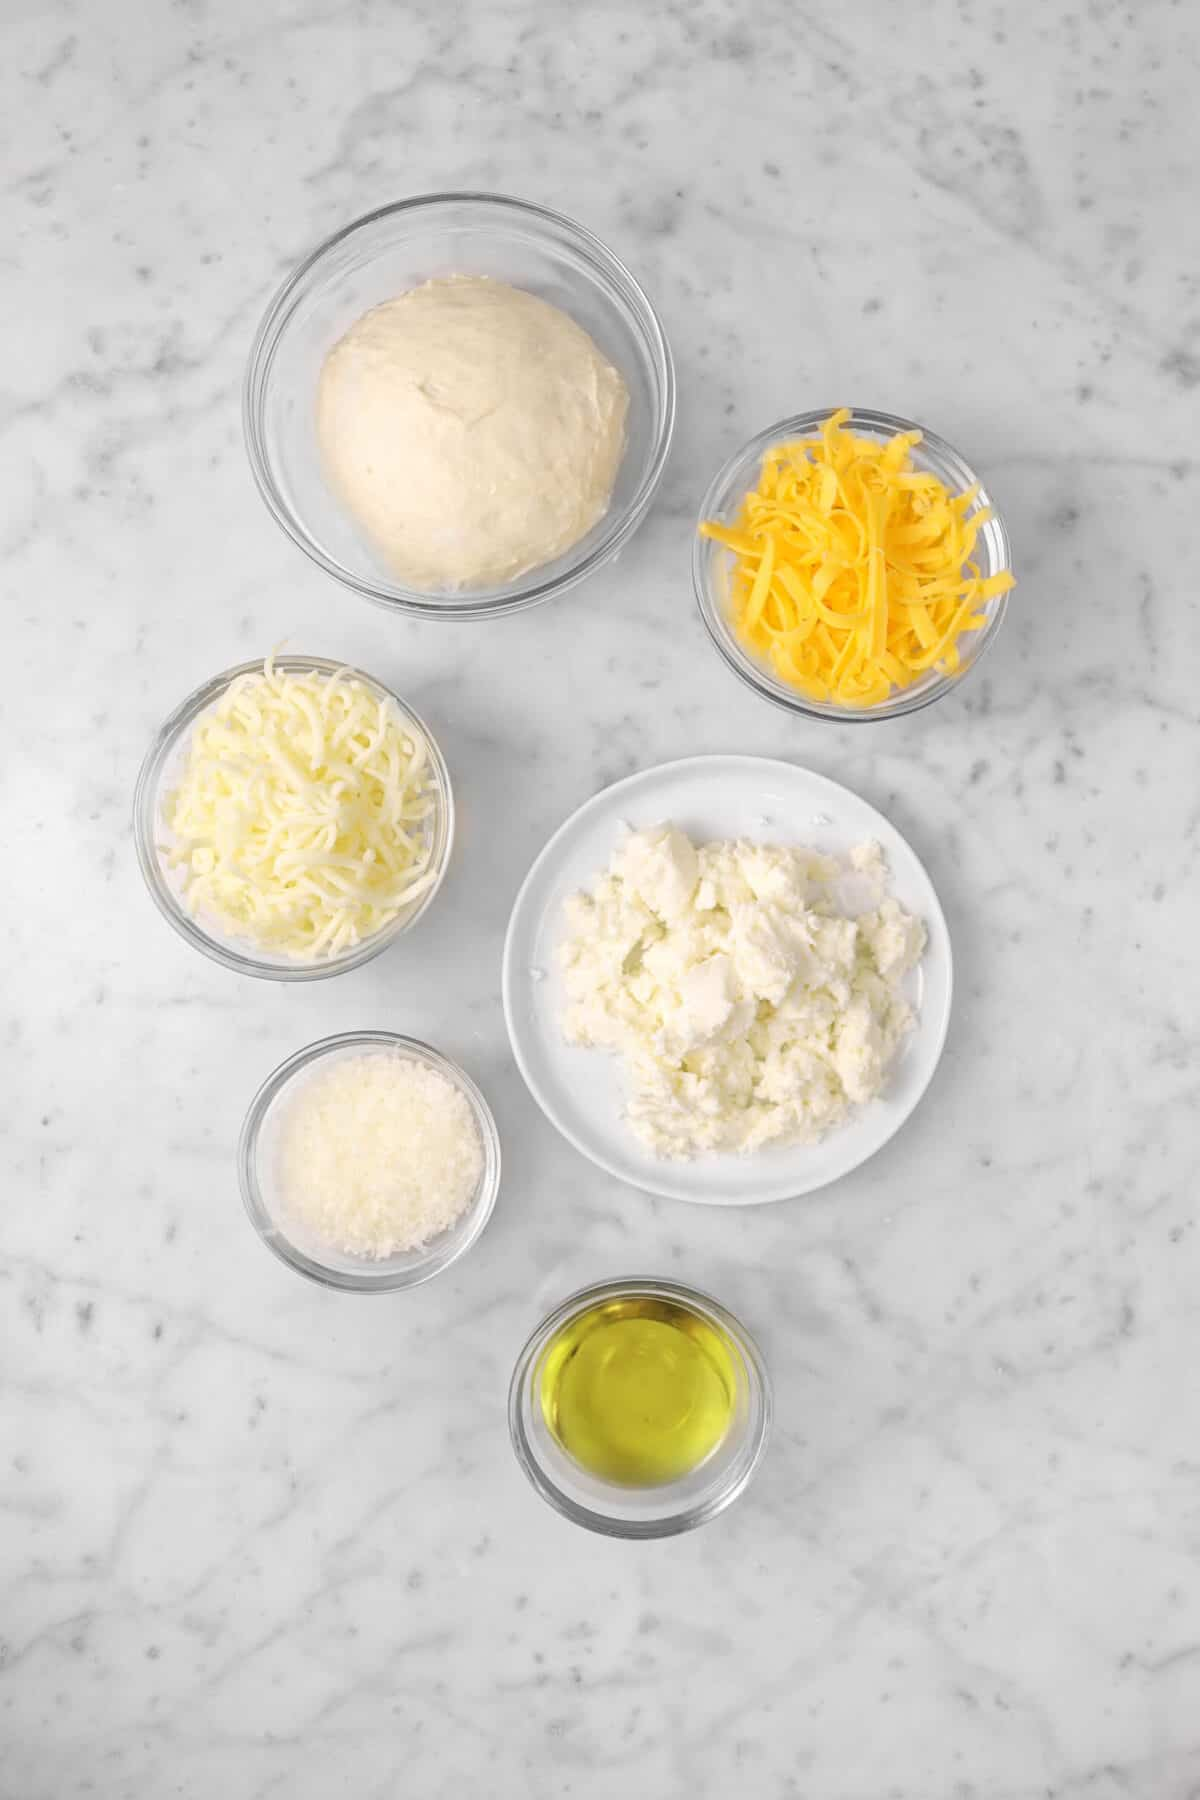 pizza dough, cheddar, mozzarella, parmesan, olive oil, fresh mozzarella on a marble counter